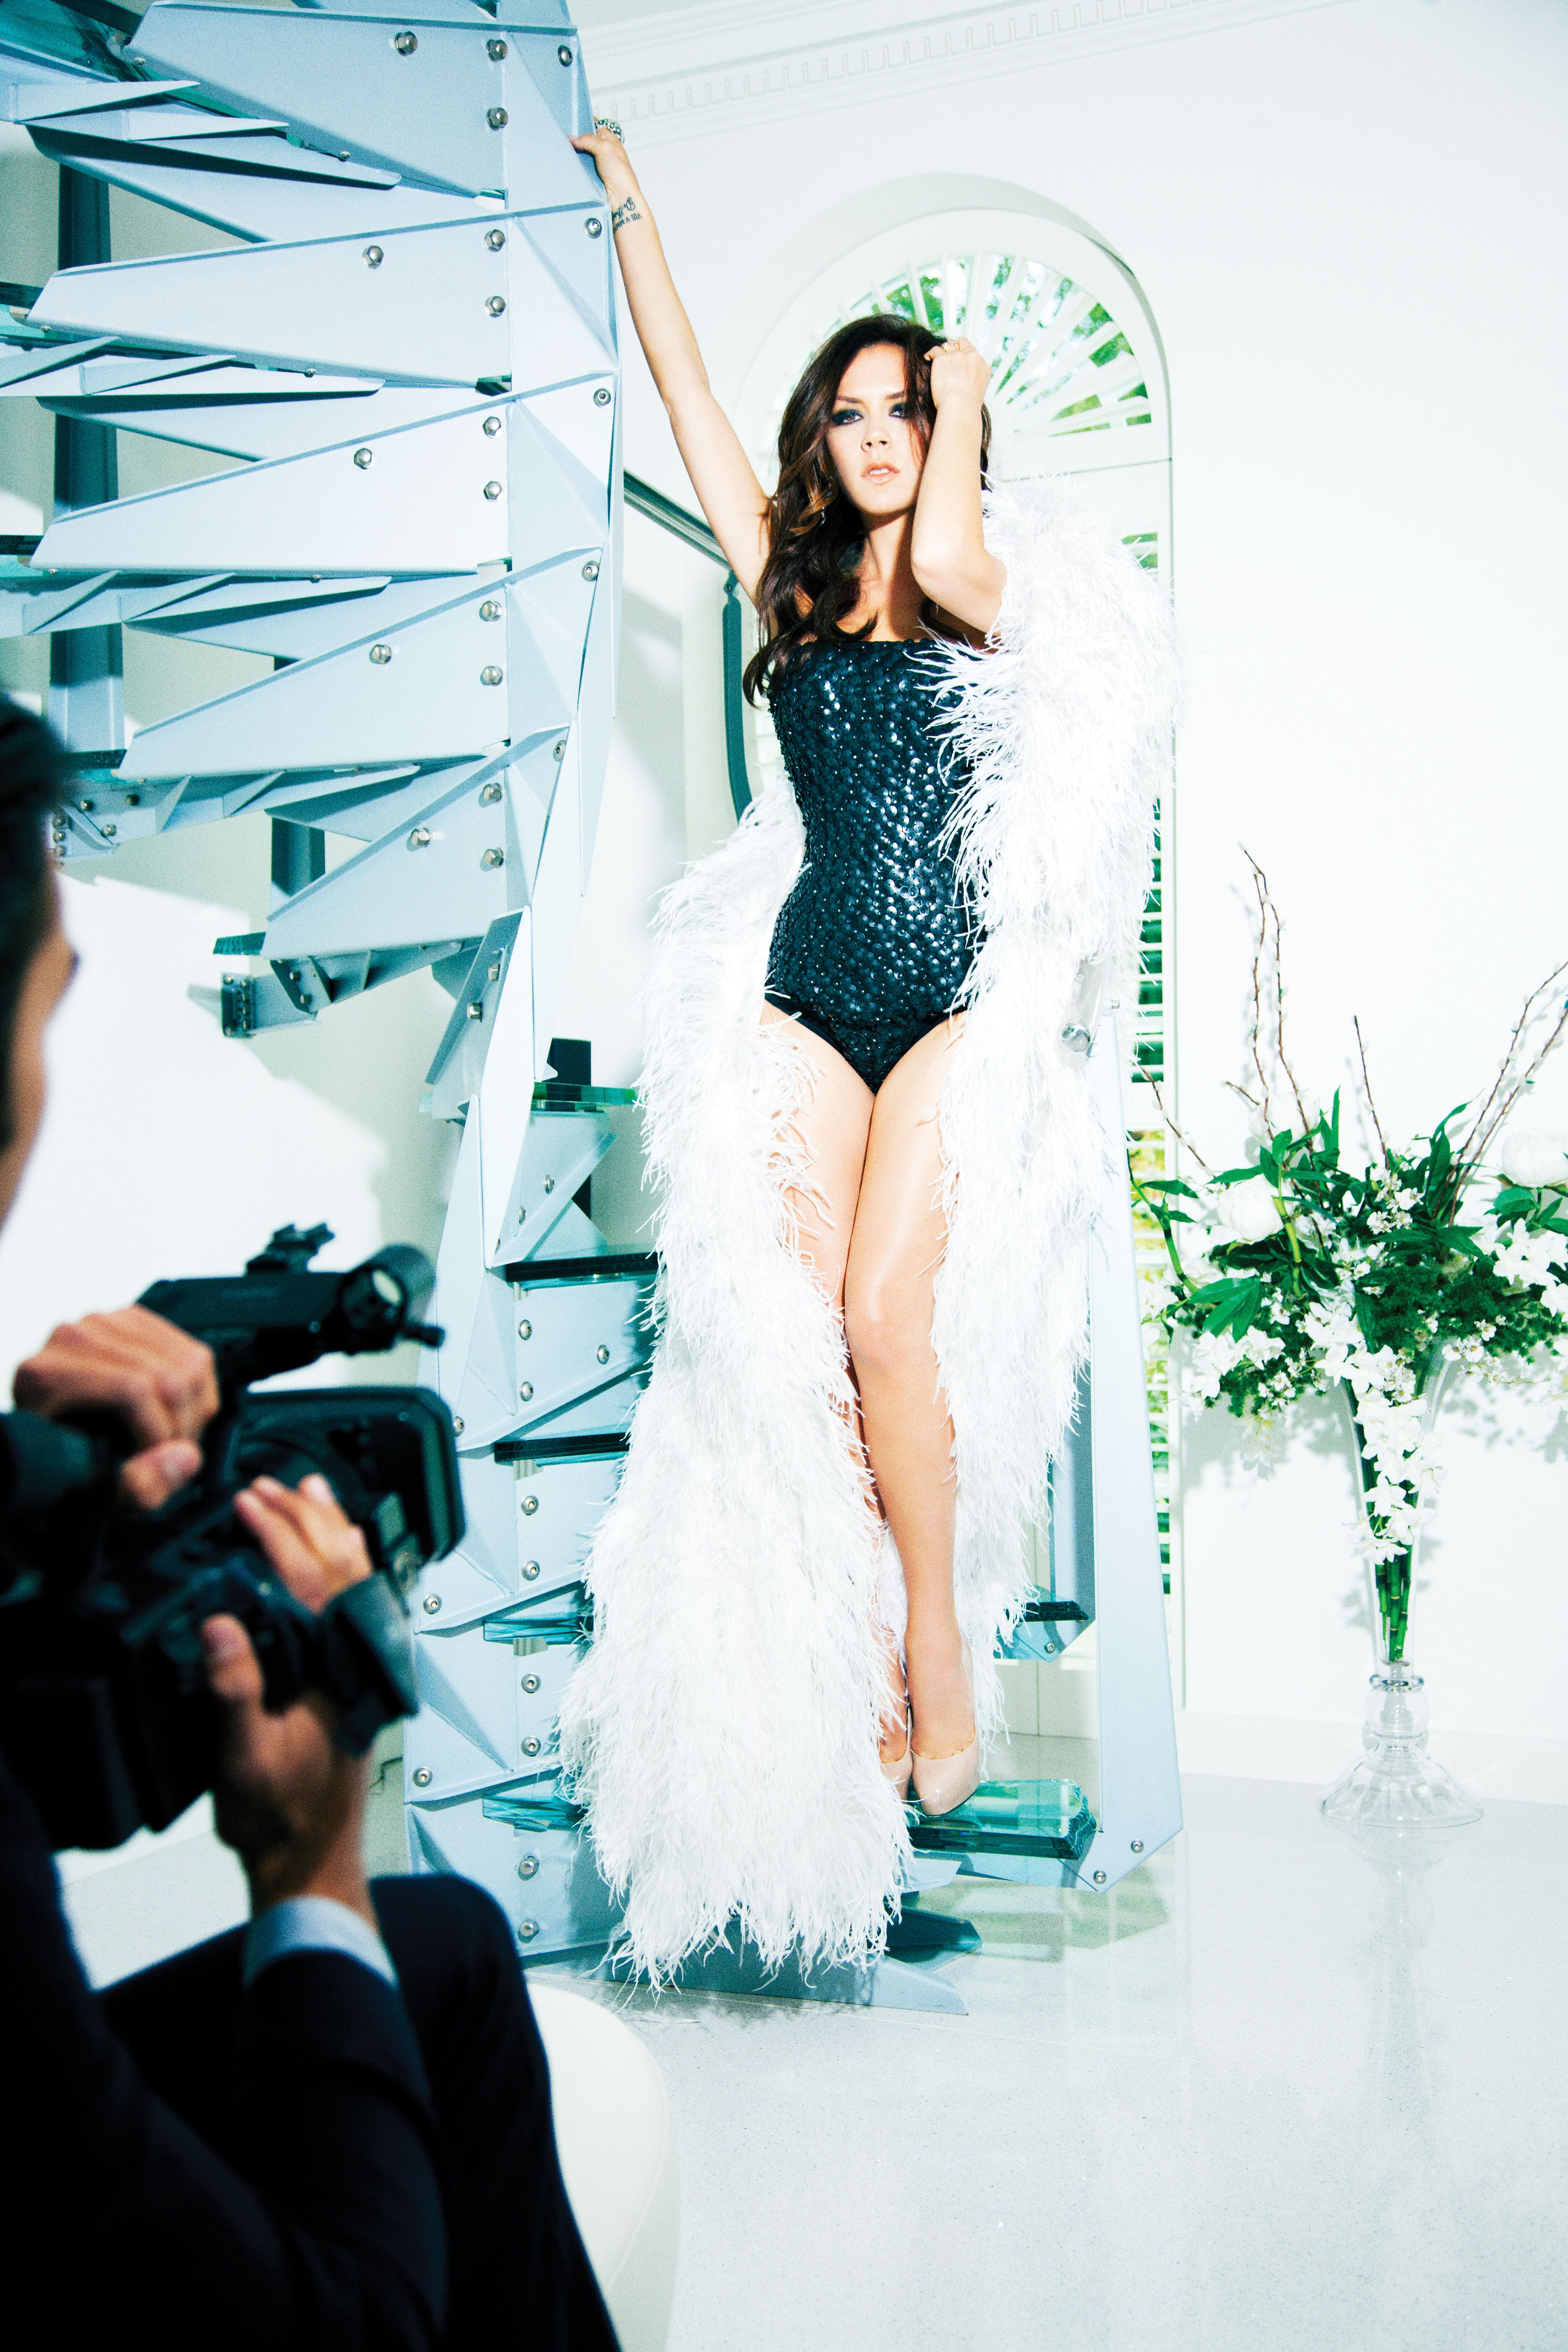 Victoria Beckham ♥ | V. B.... | Pinterest | Victoria beckham and ...